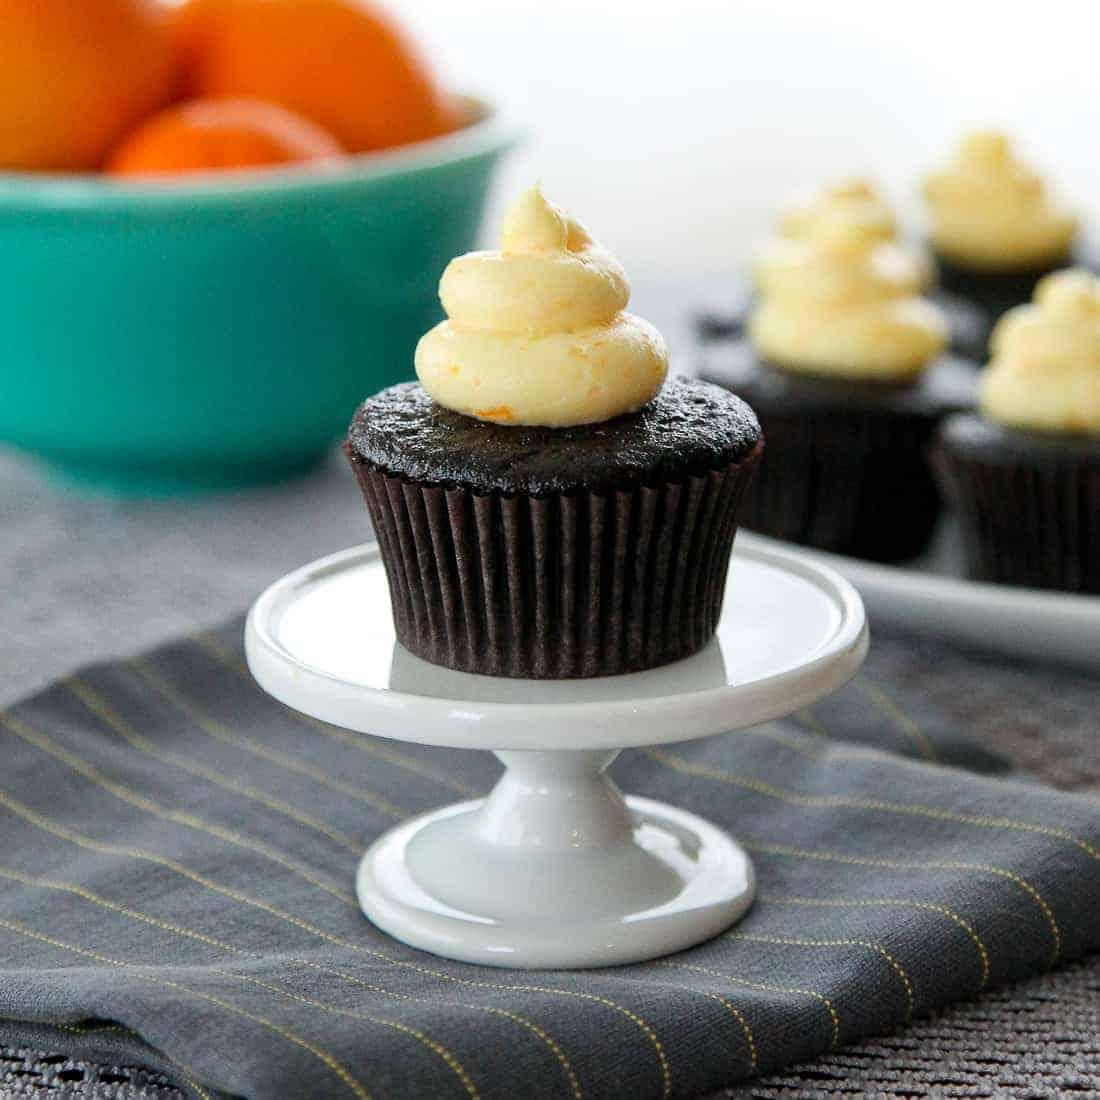 OrangeCreamsicleCupcakes